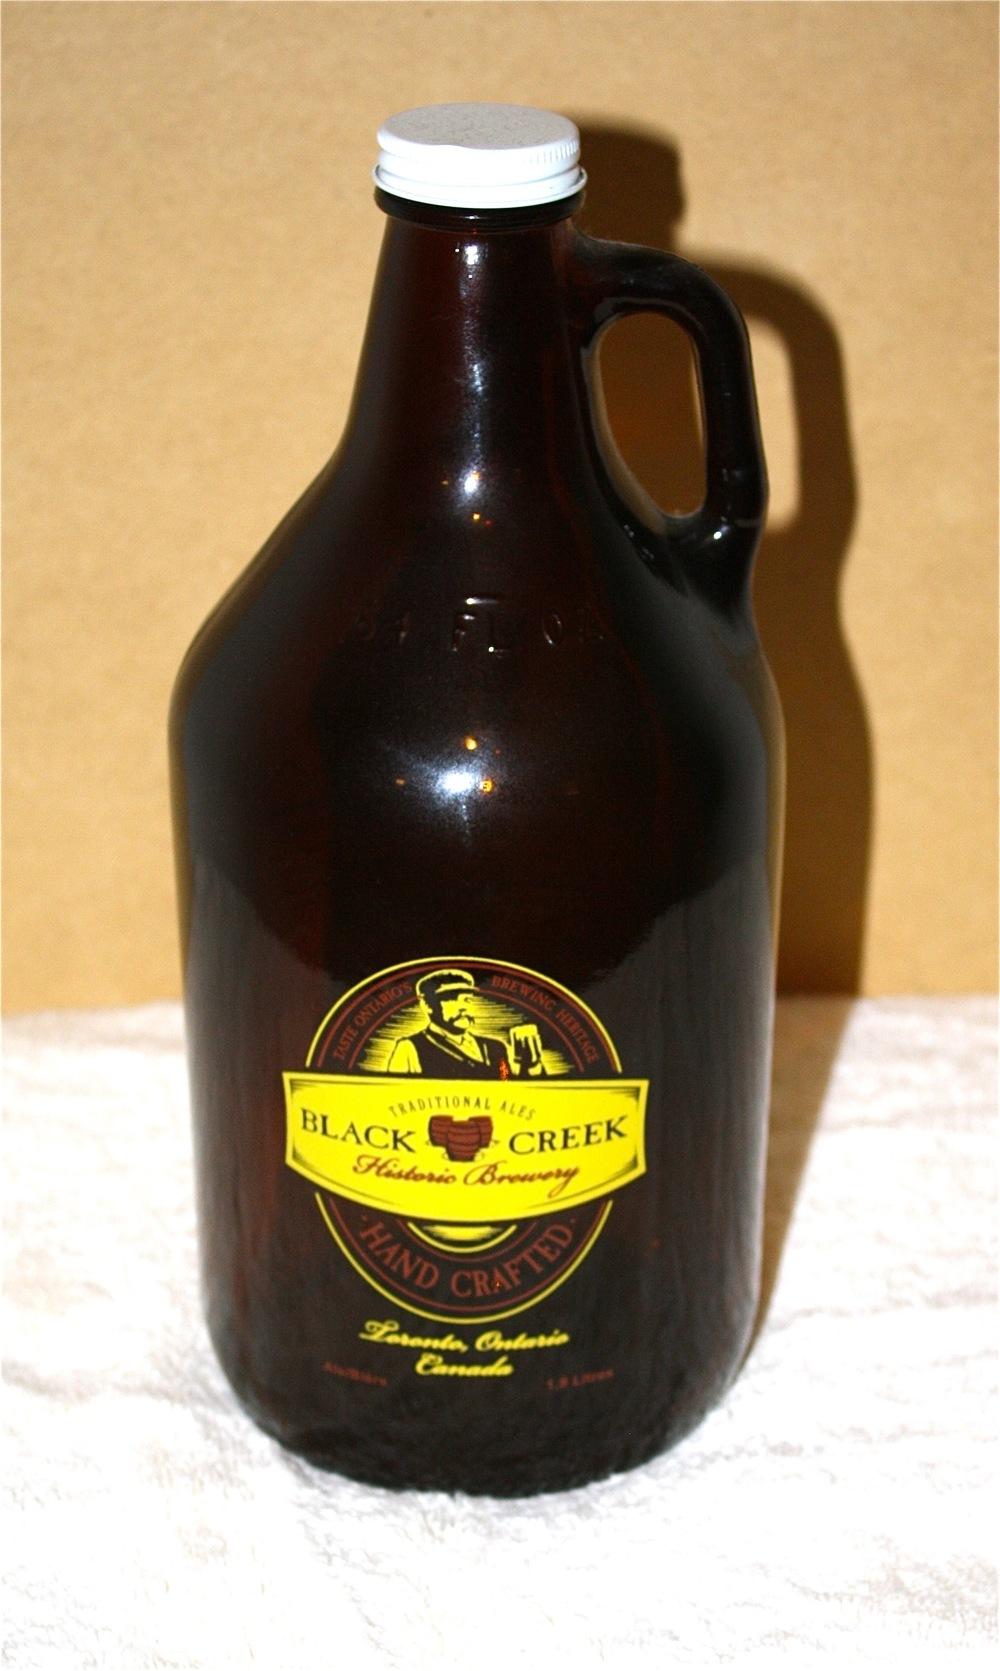 GR - Black Creek Historic Brewery (ON).jpg